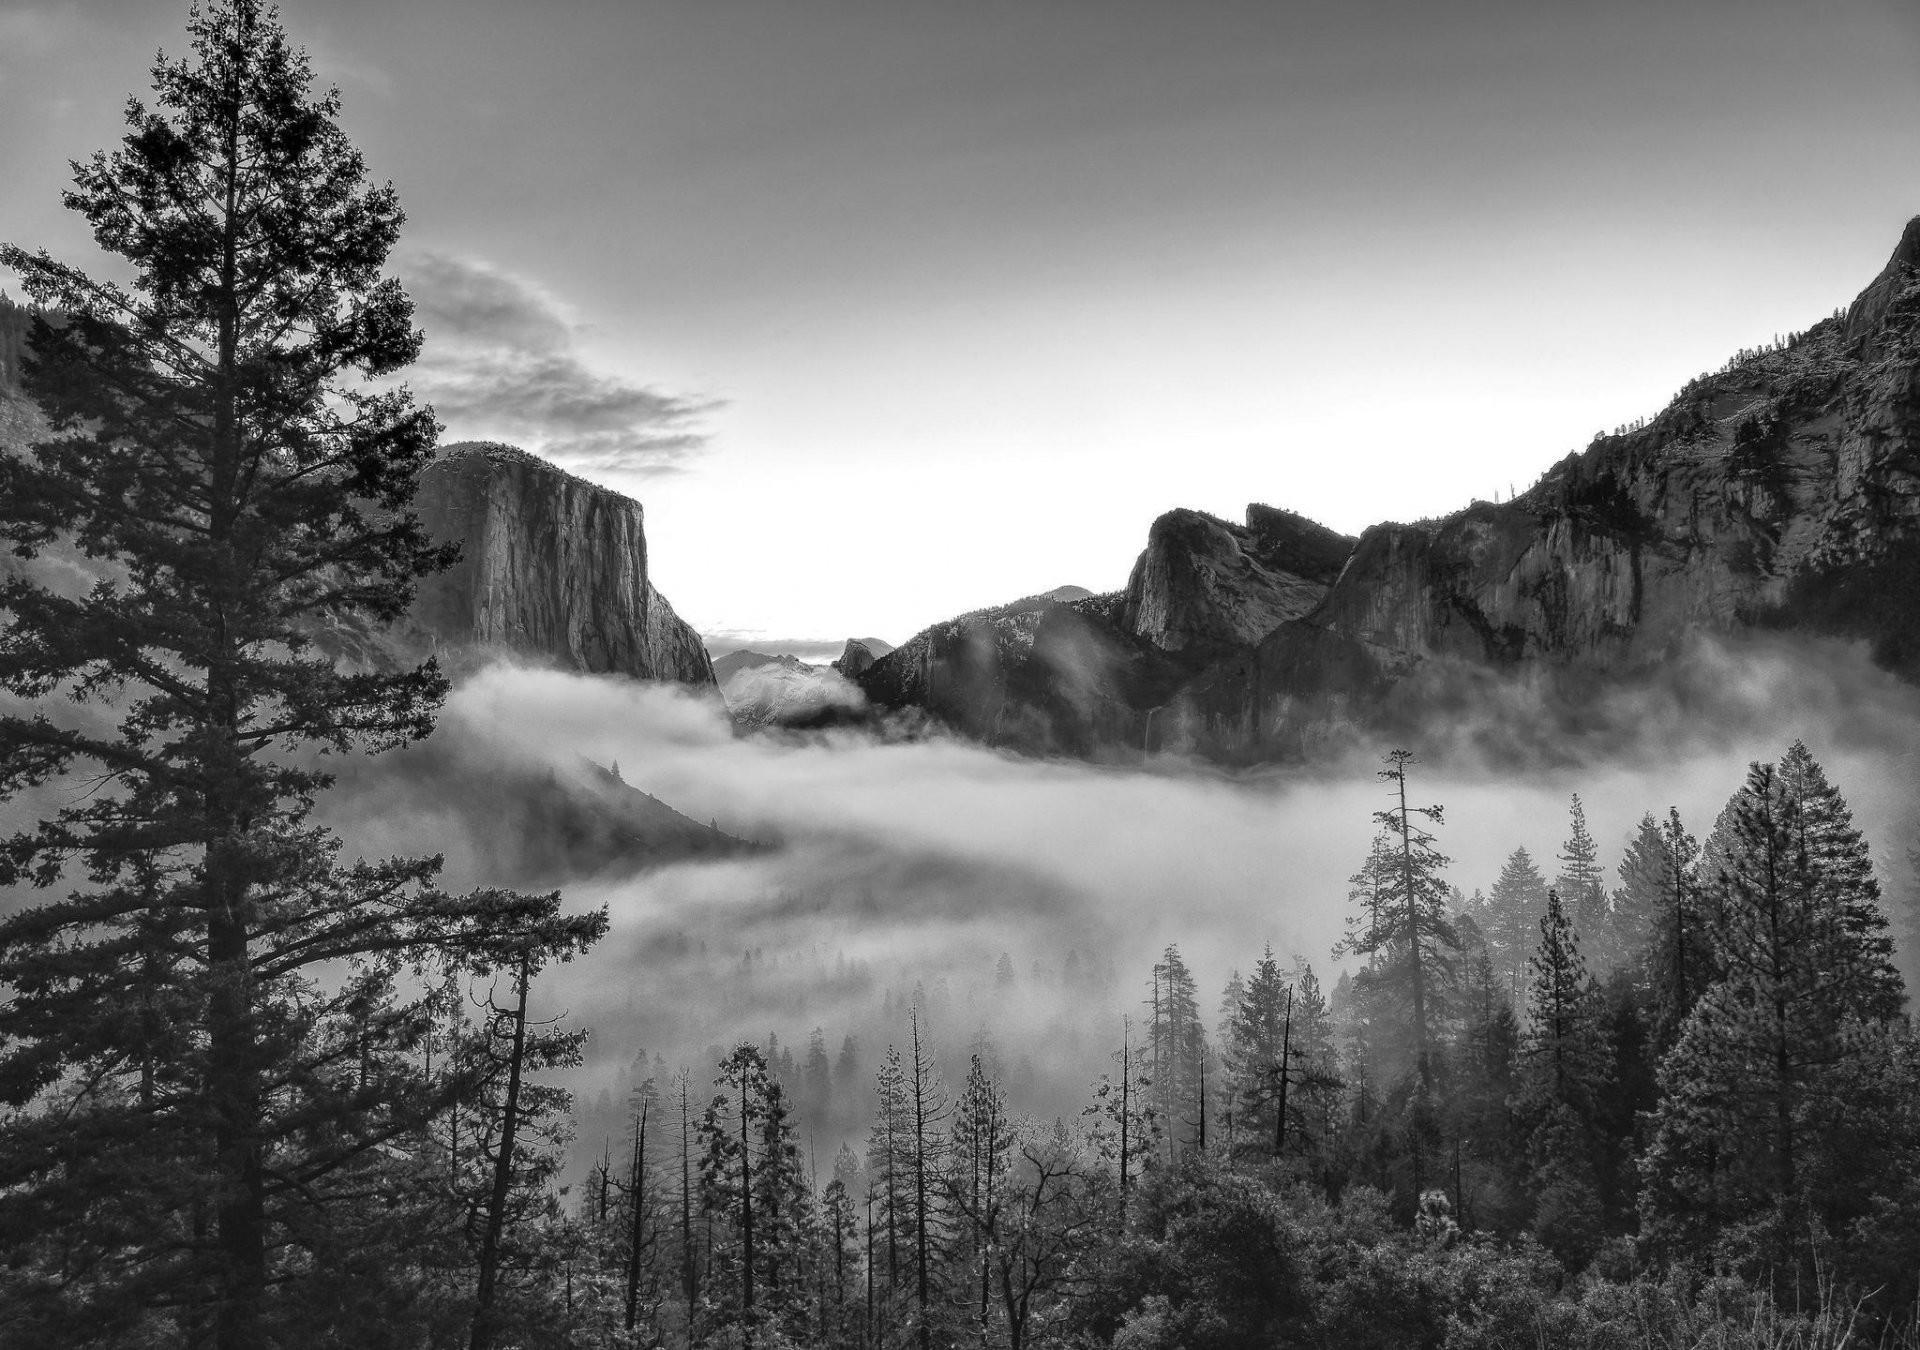 mountain nature forest park photo black and white united states california  yosemite